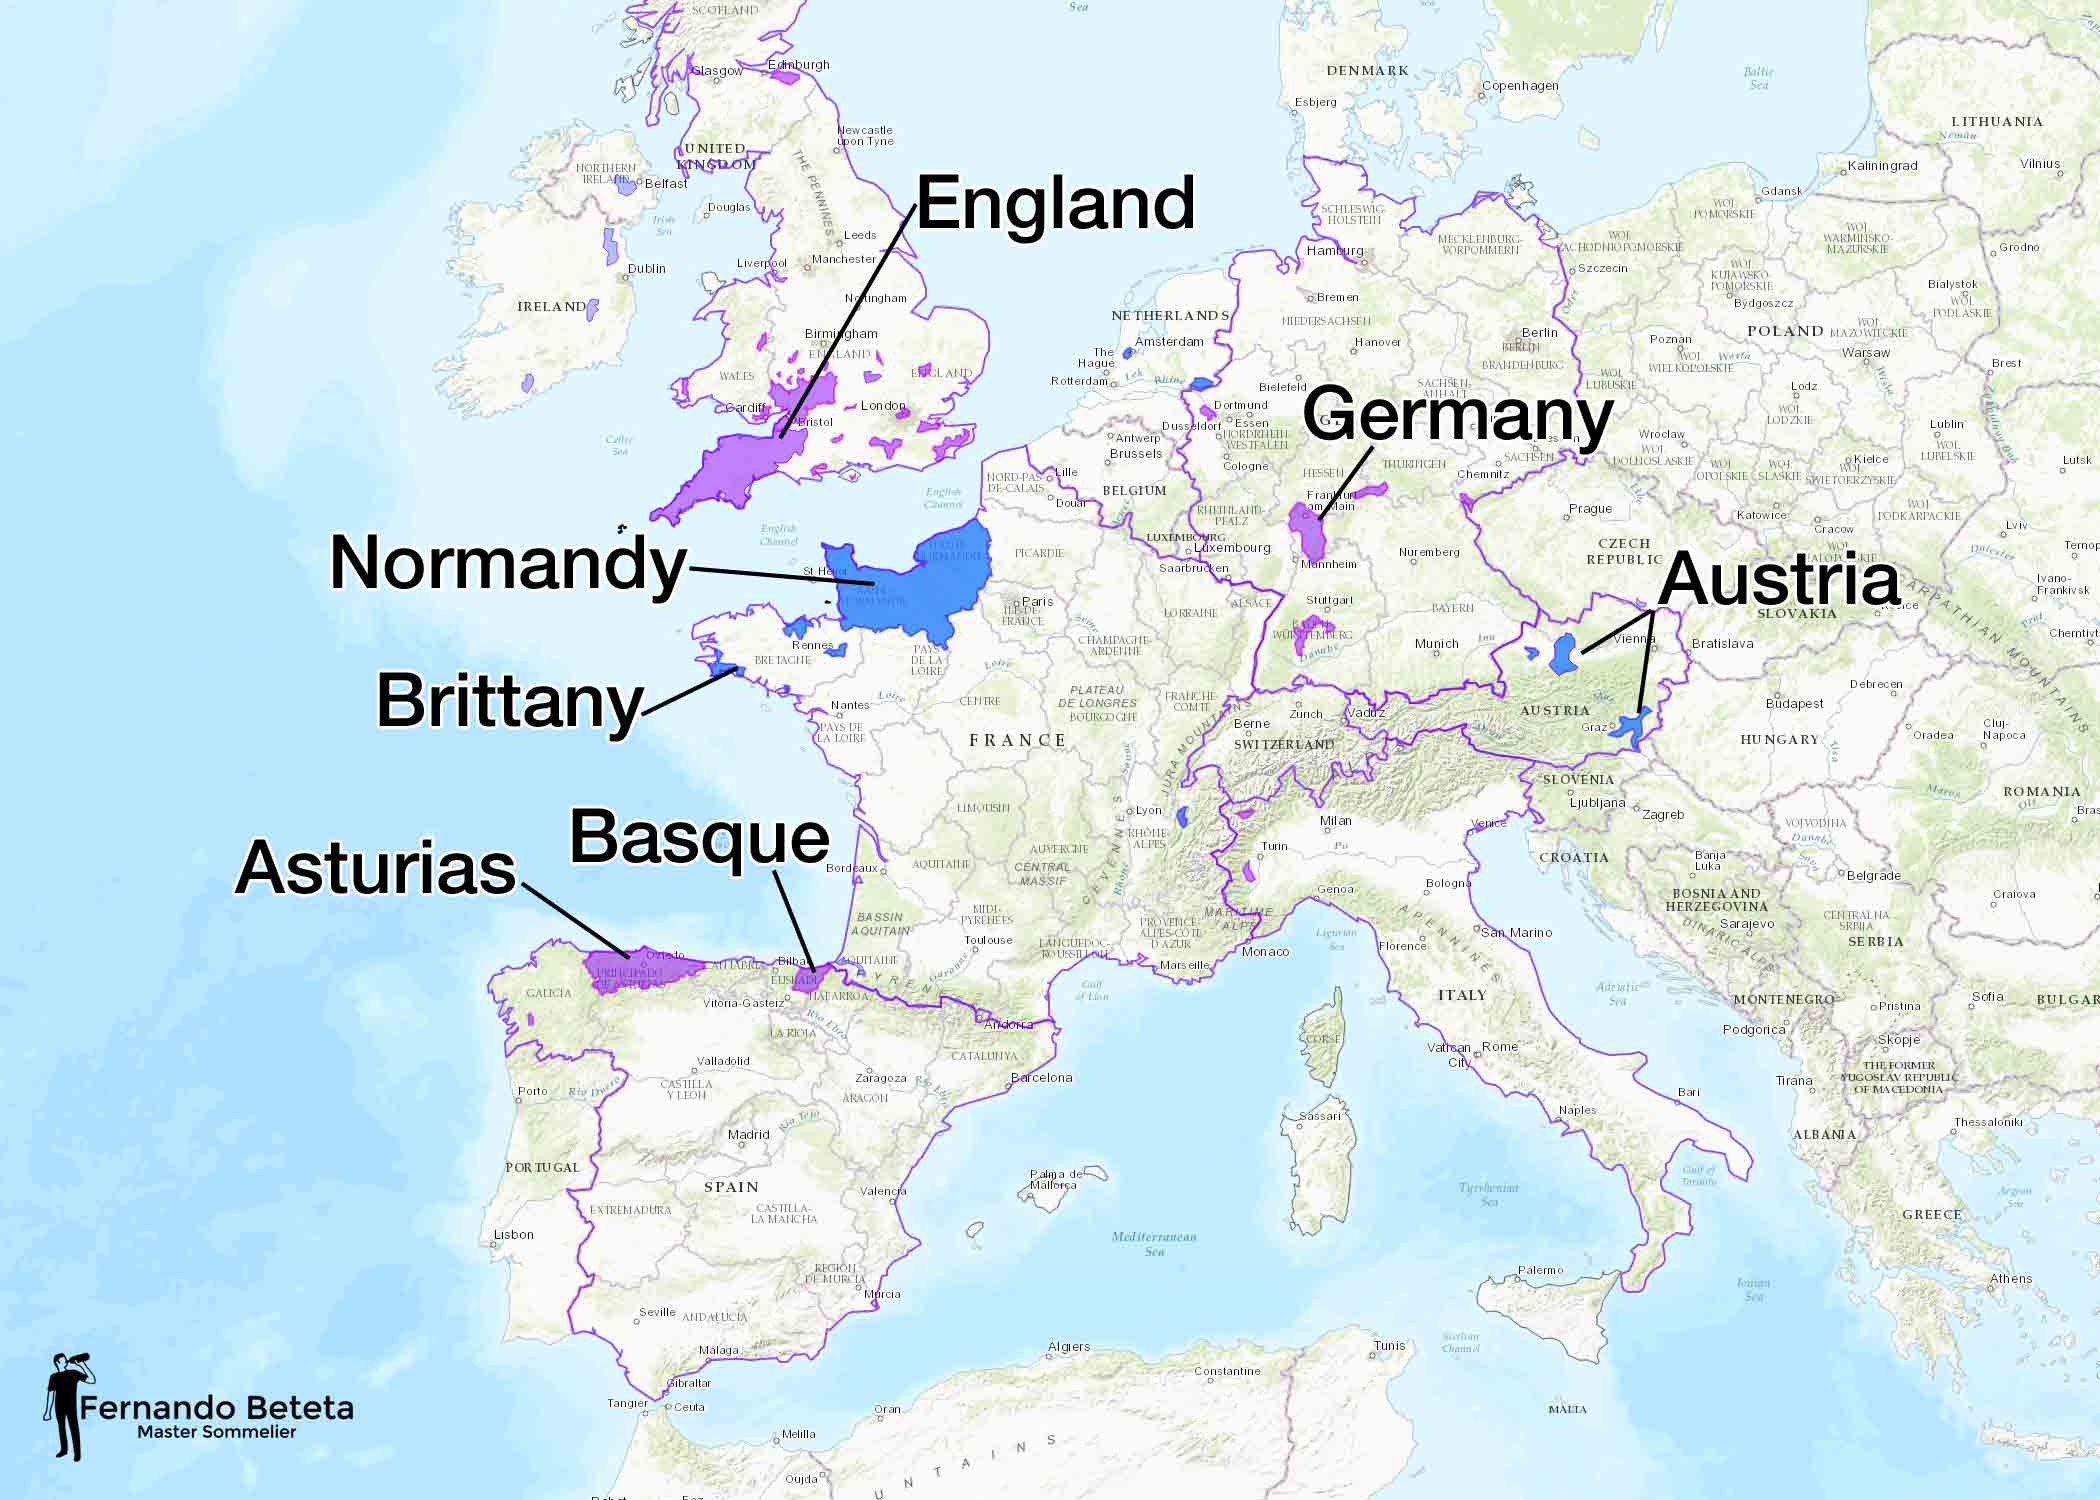 Cider producing regions of Europe